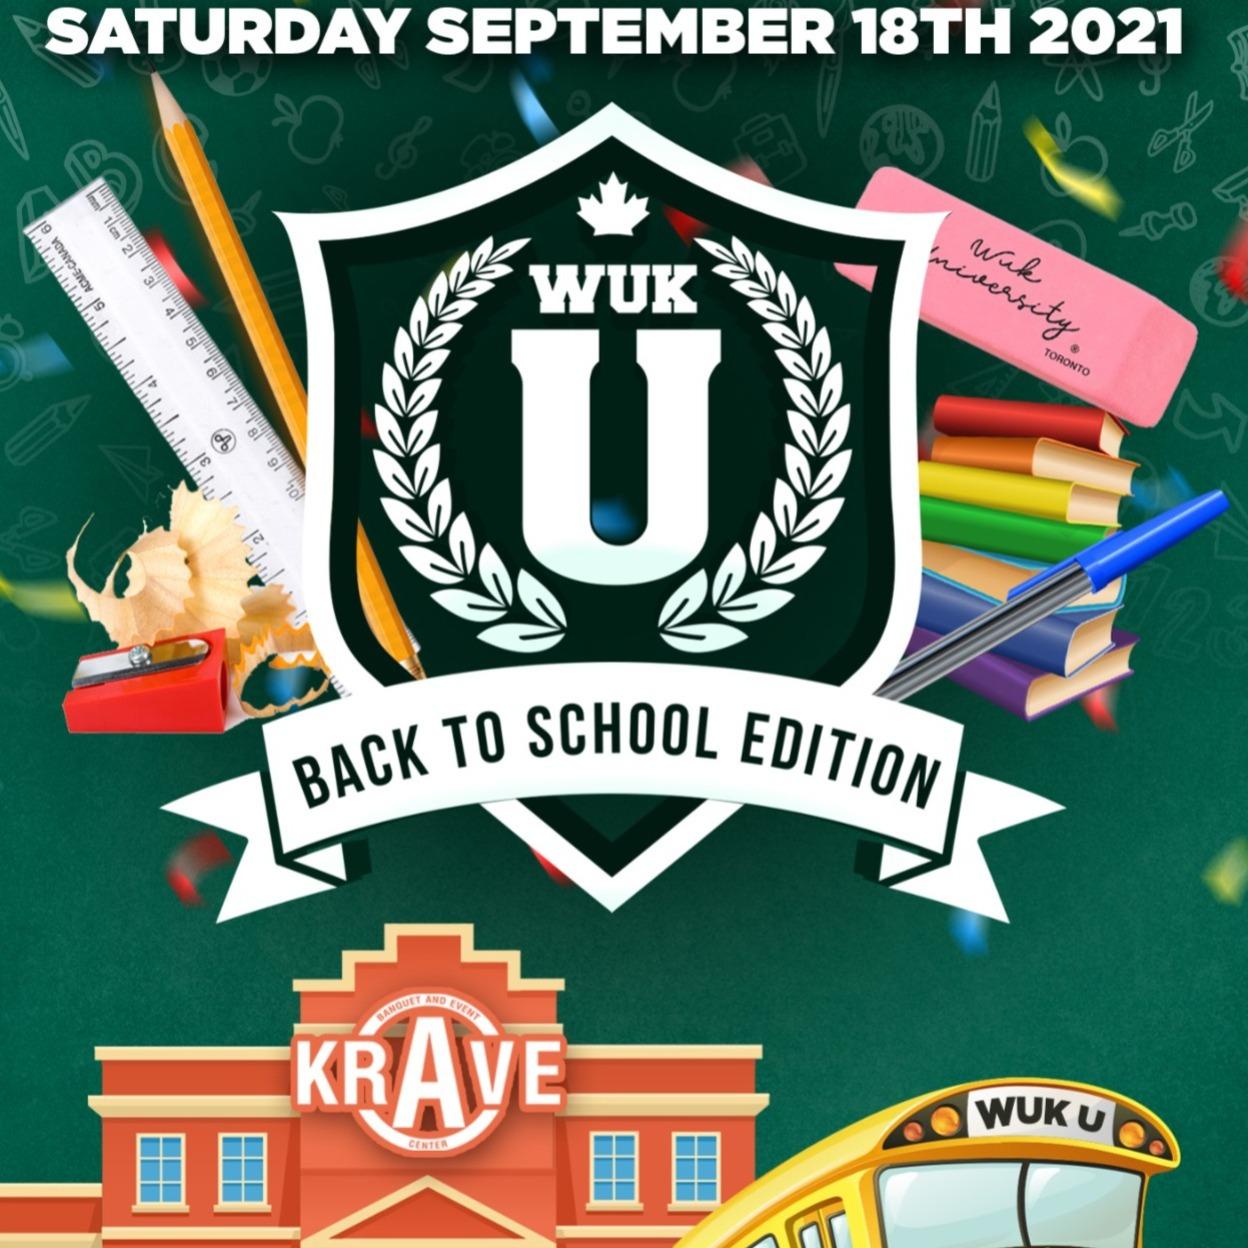 WUK U - BACK TO SCHOOL 2021